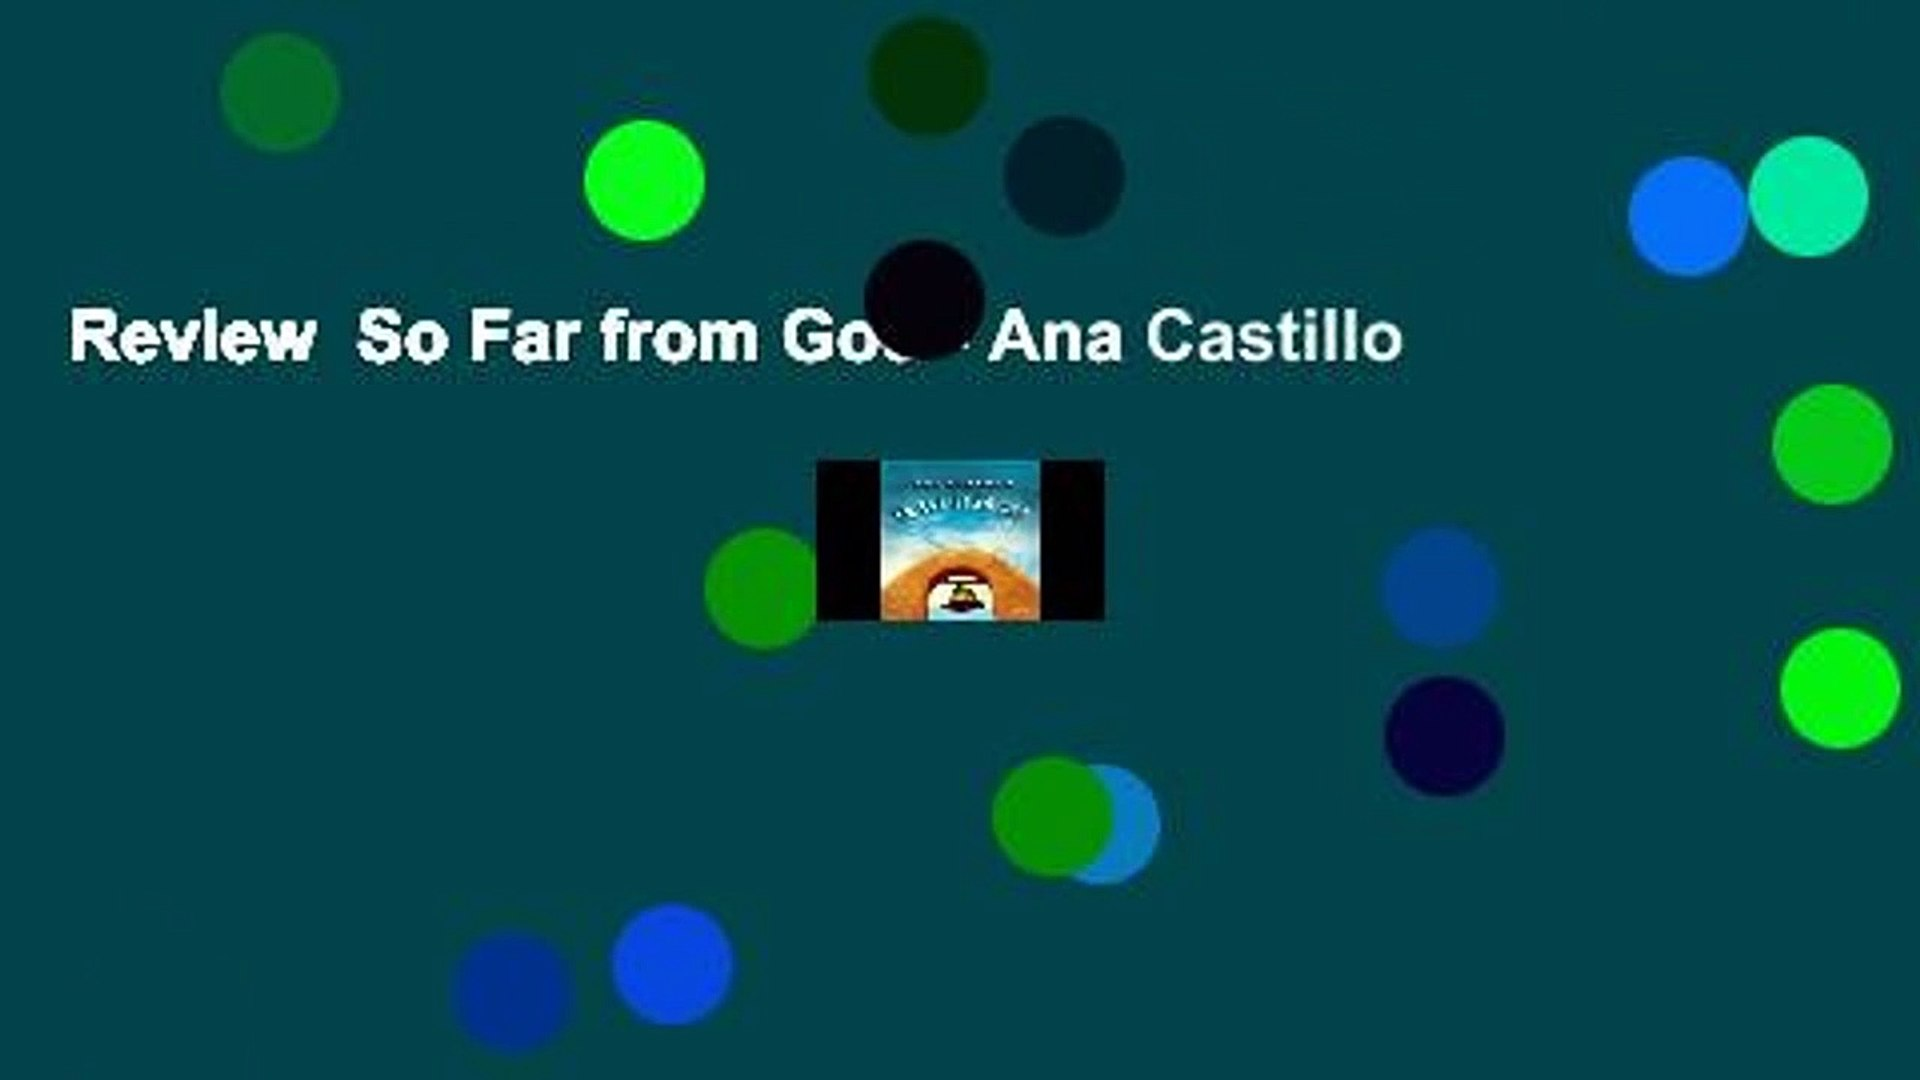 Review  So Far from God - Ana Castillo